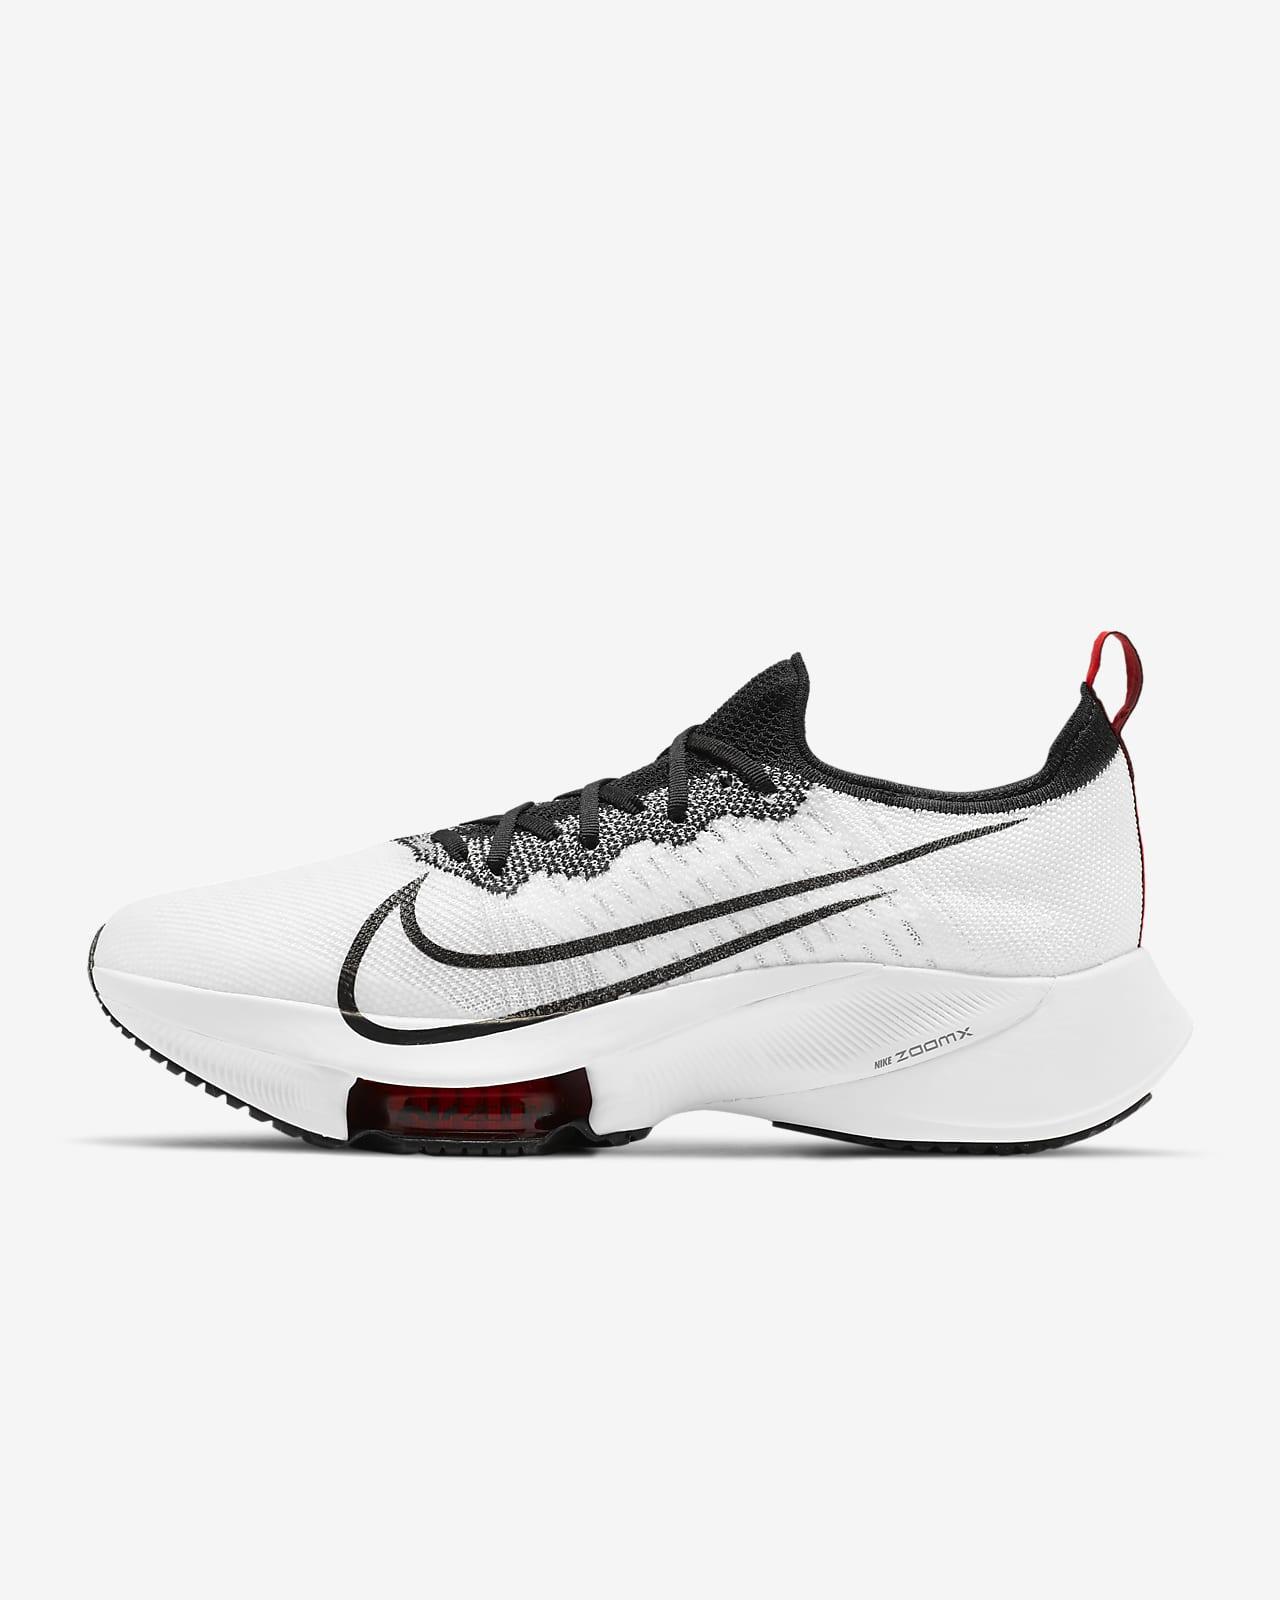 Nike Air Zoom Tempo NEXT% Men's Running